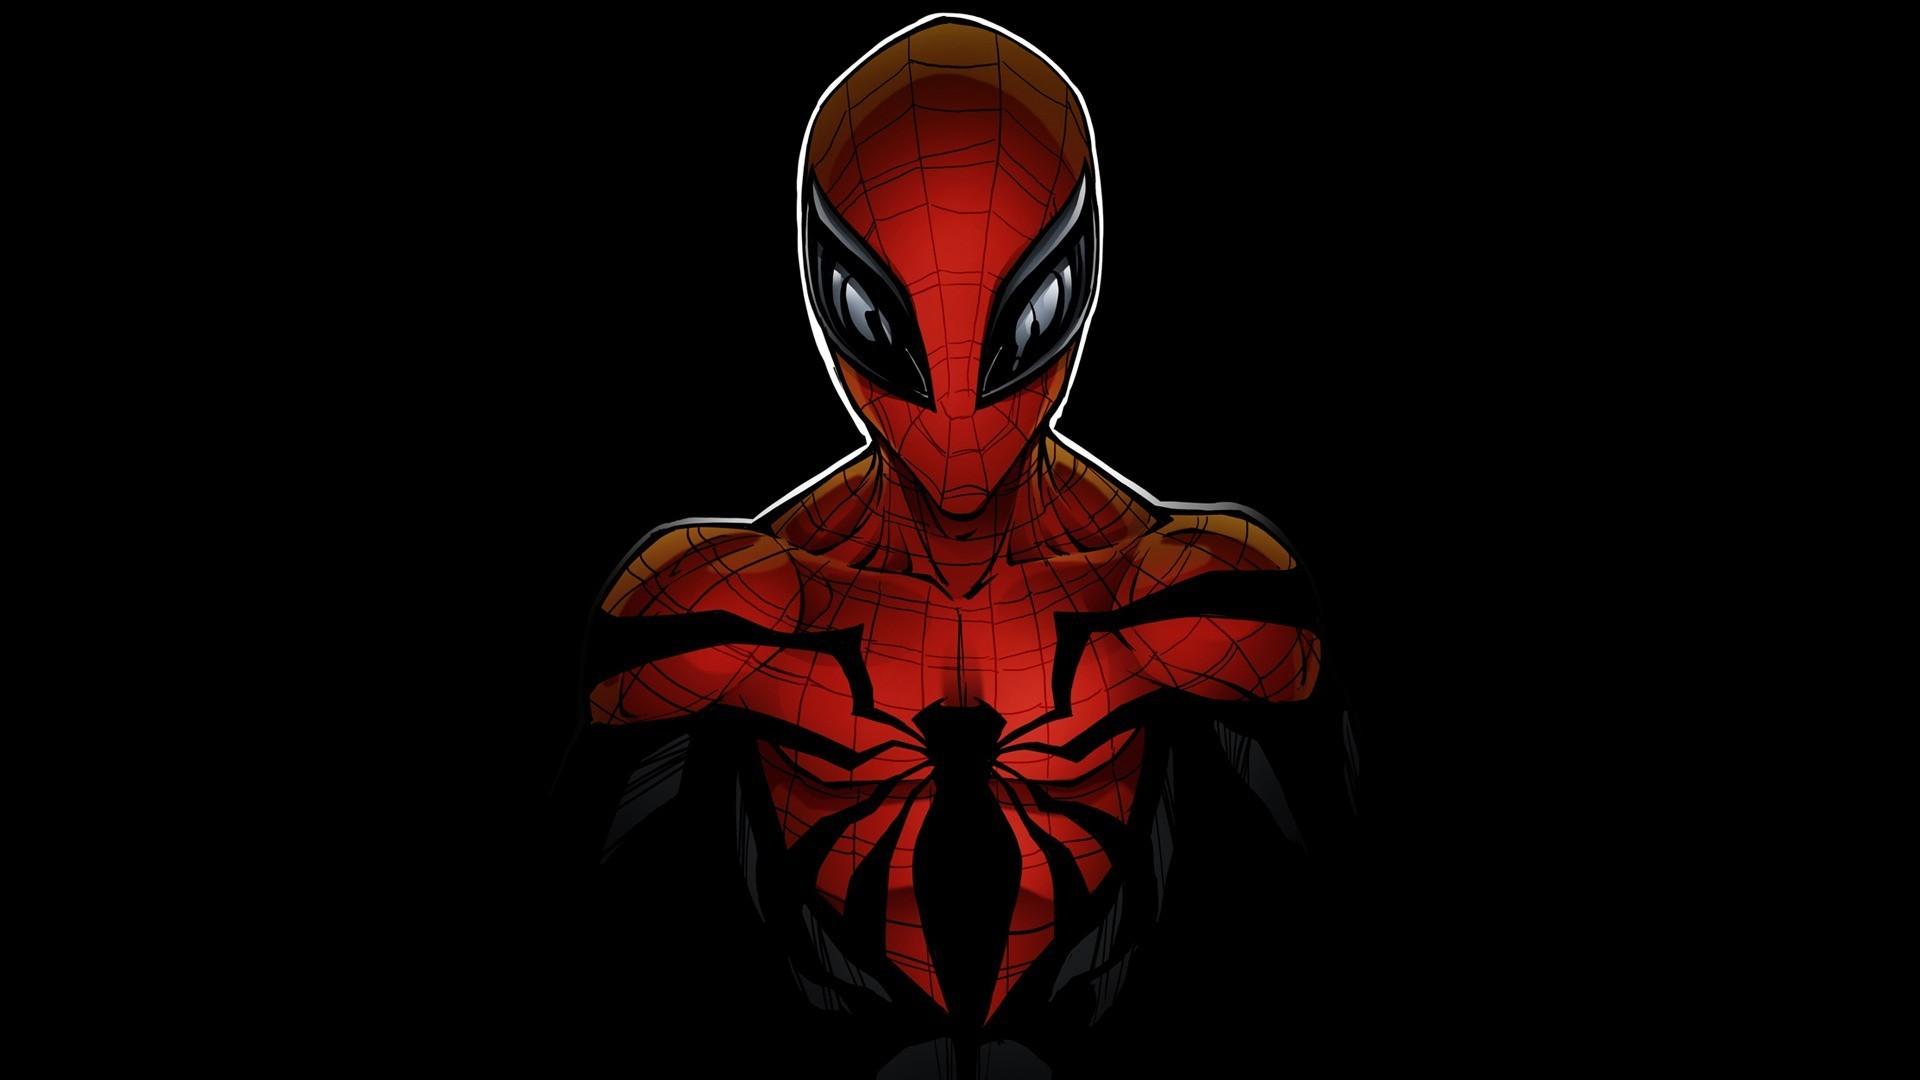 Spiderman Logo Wallpaper Hd 1080p 13